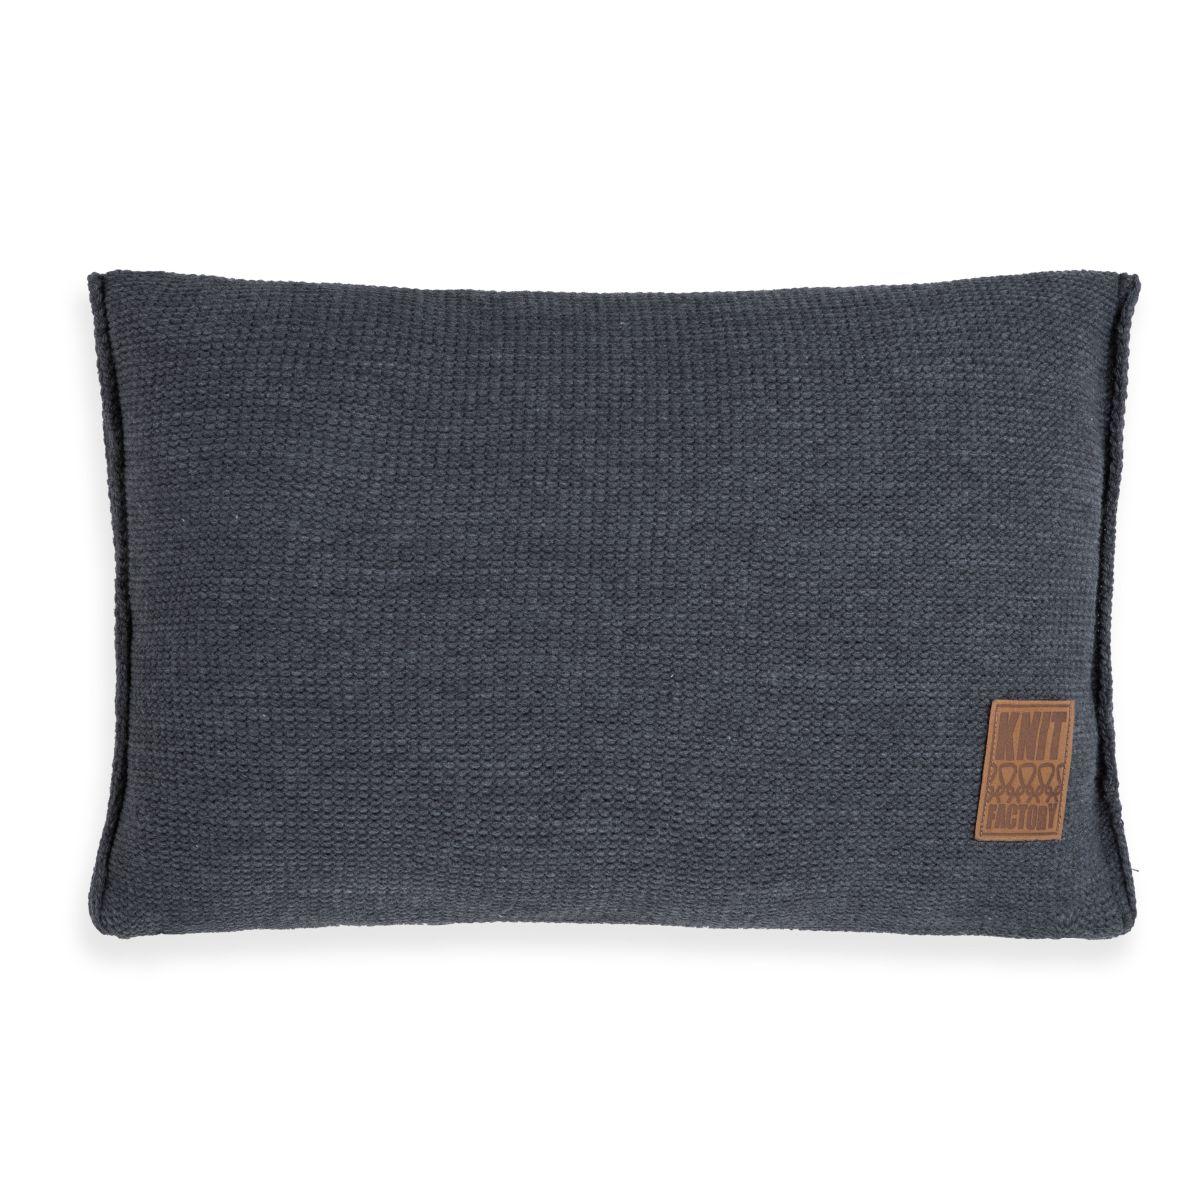 knit factory 1131310 kussen 60x40 uni antraciet 1